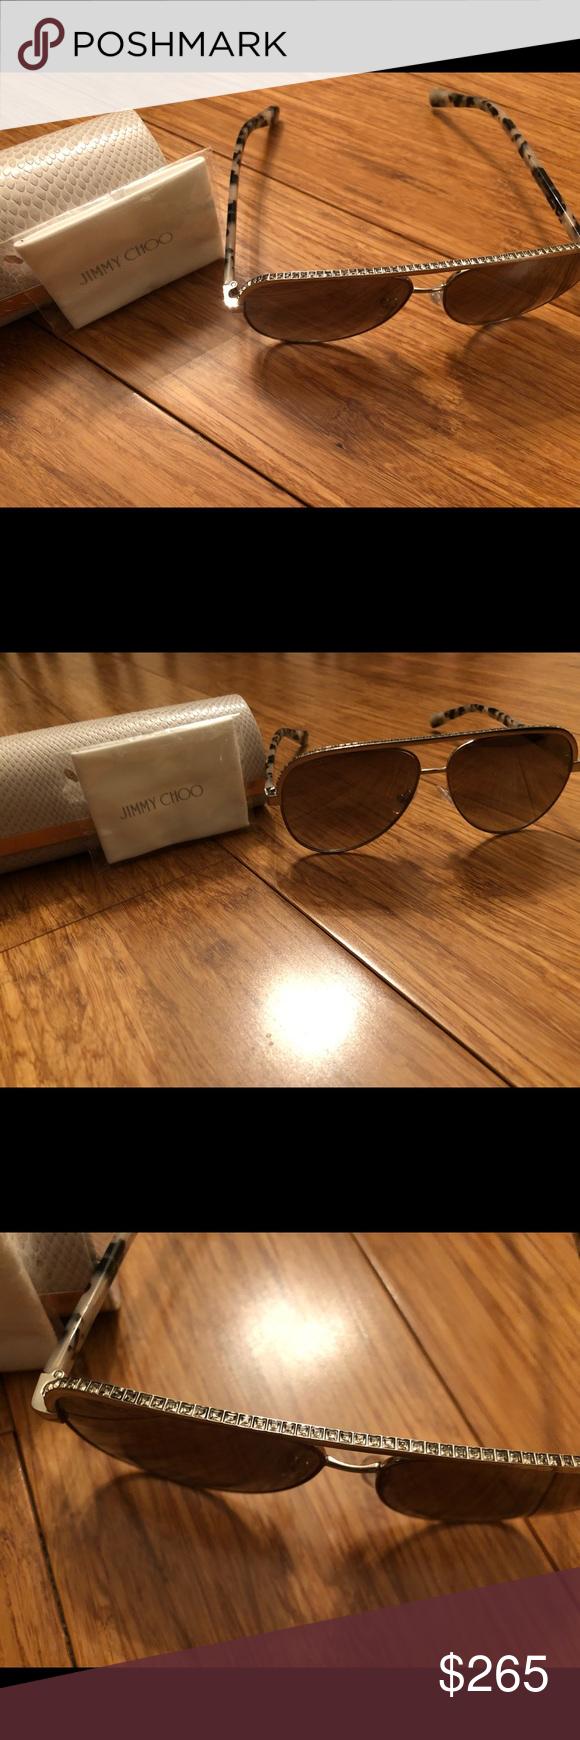 db476ac00a3 Jimmy Choo Rhinestone top sunglasses New! Worn only one time! Authentic  rhinestone top jimmy